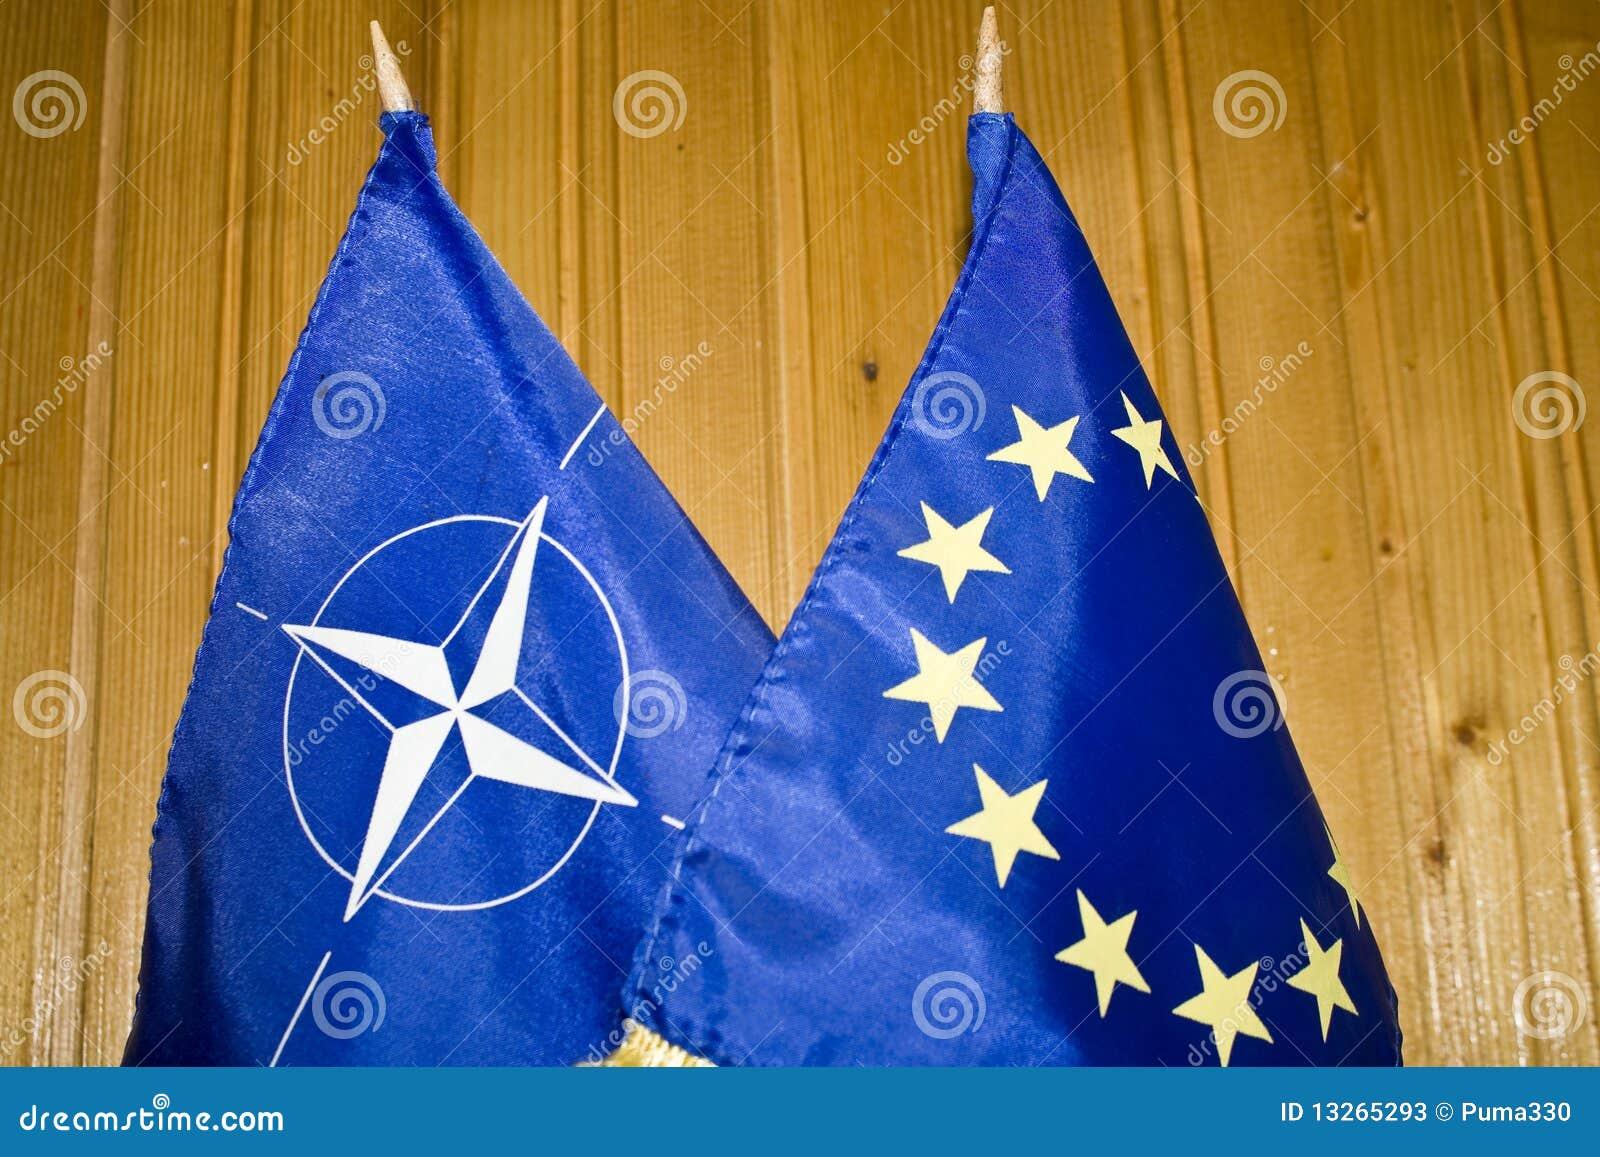 NATO and EU flags